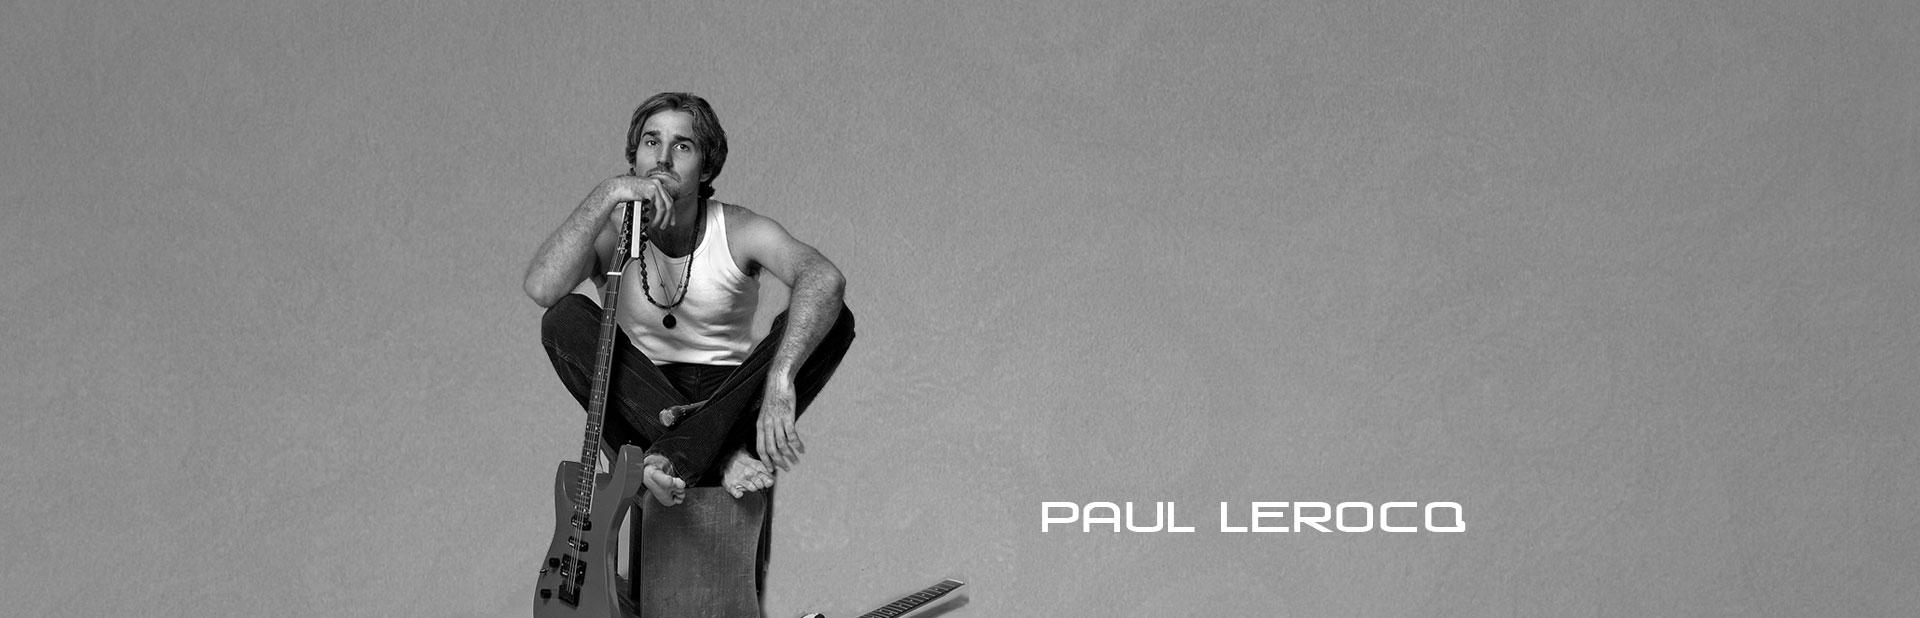 Paul Lerocq